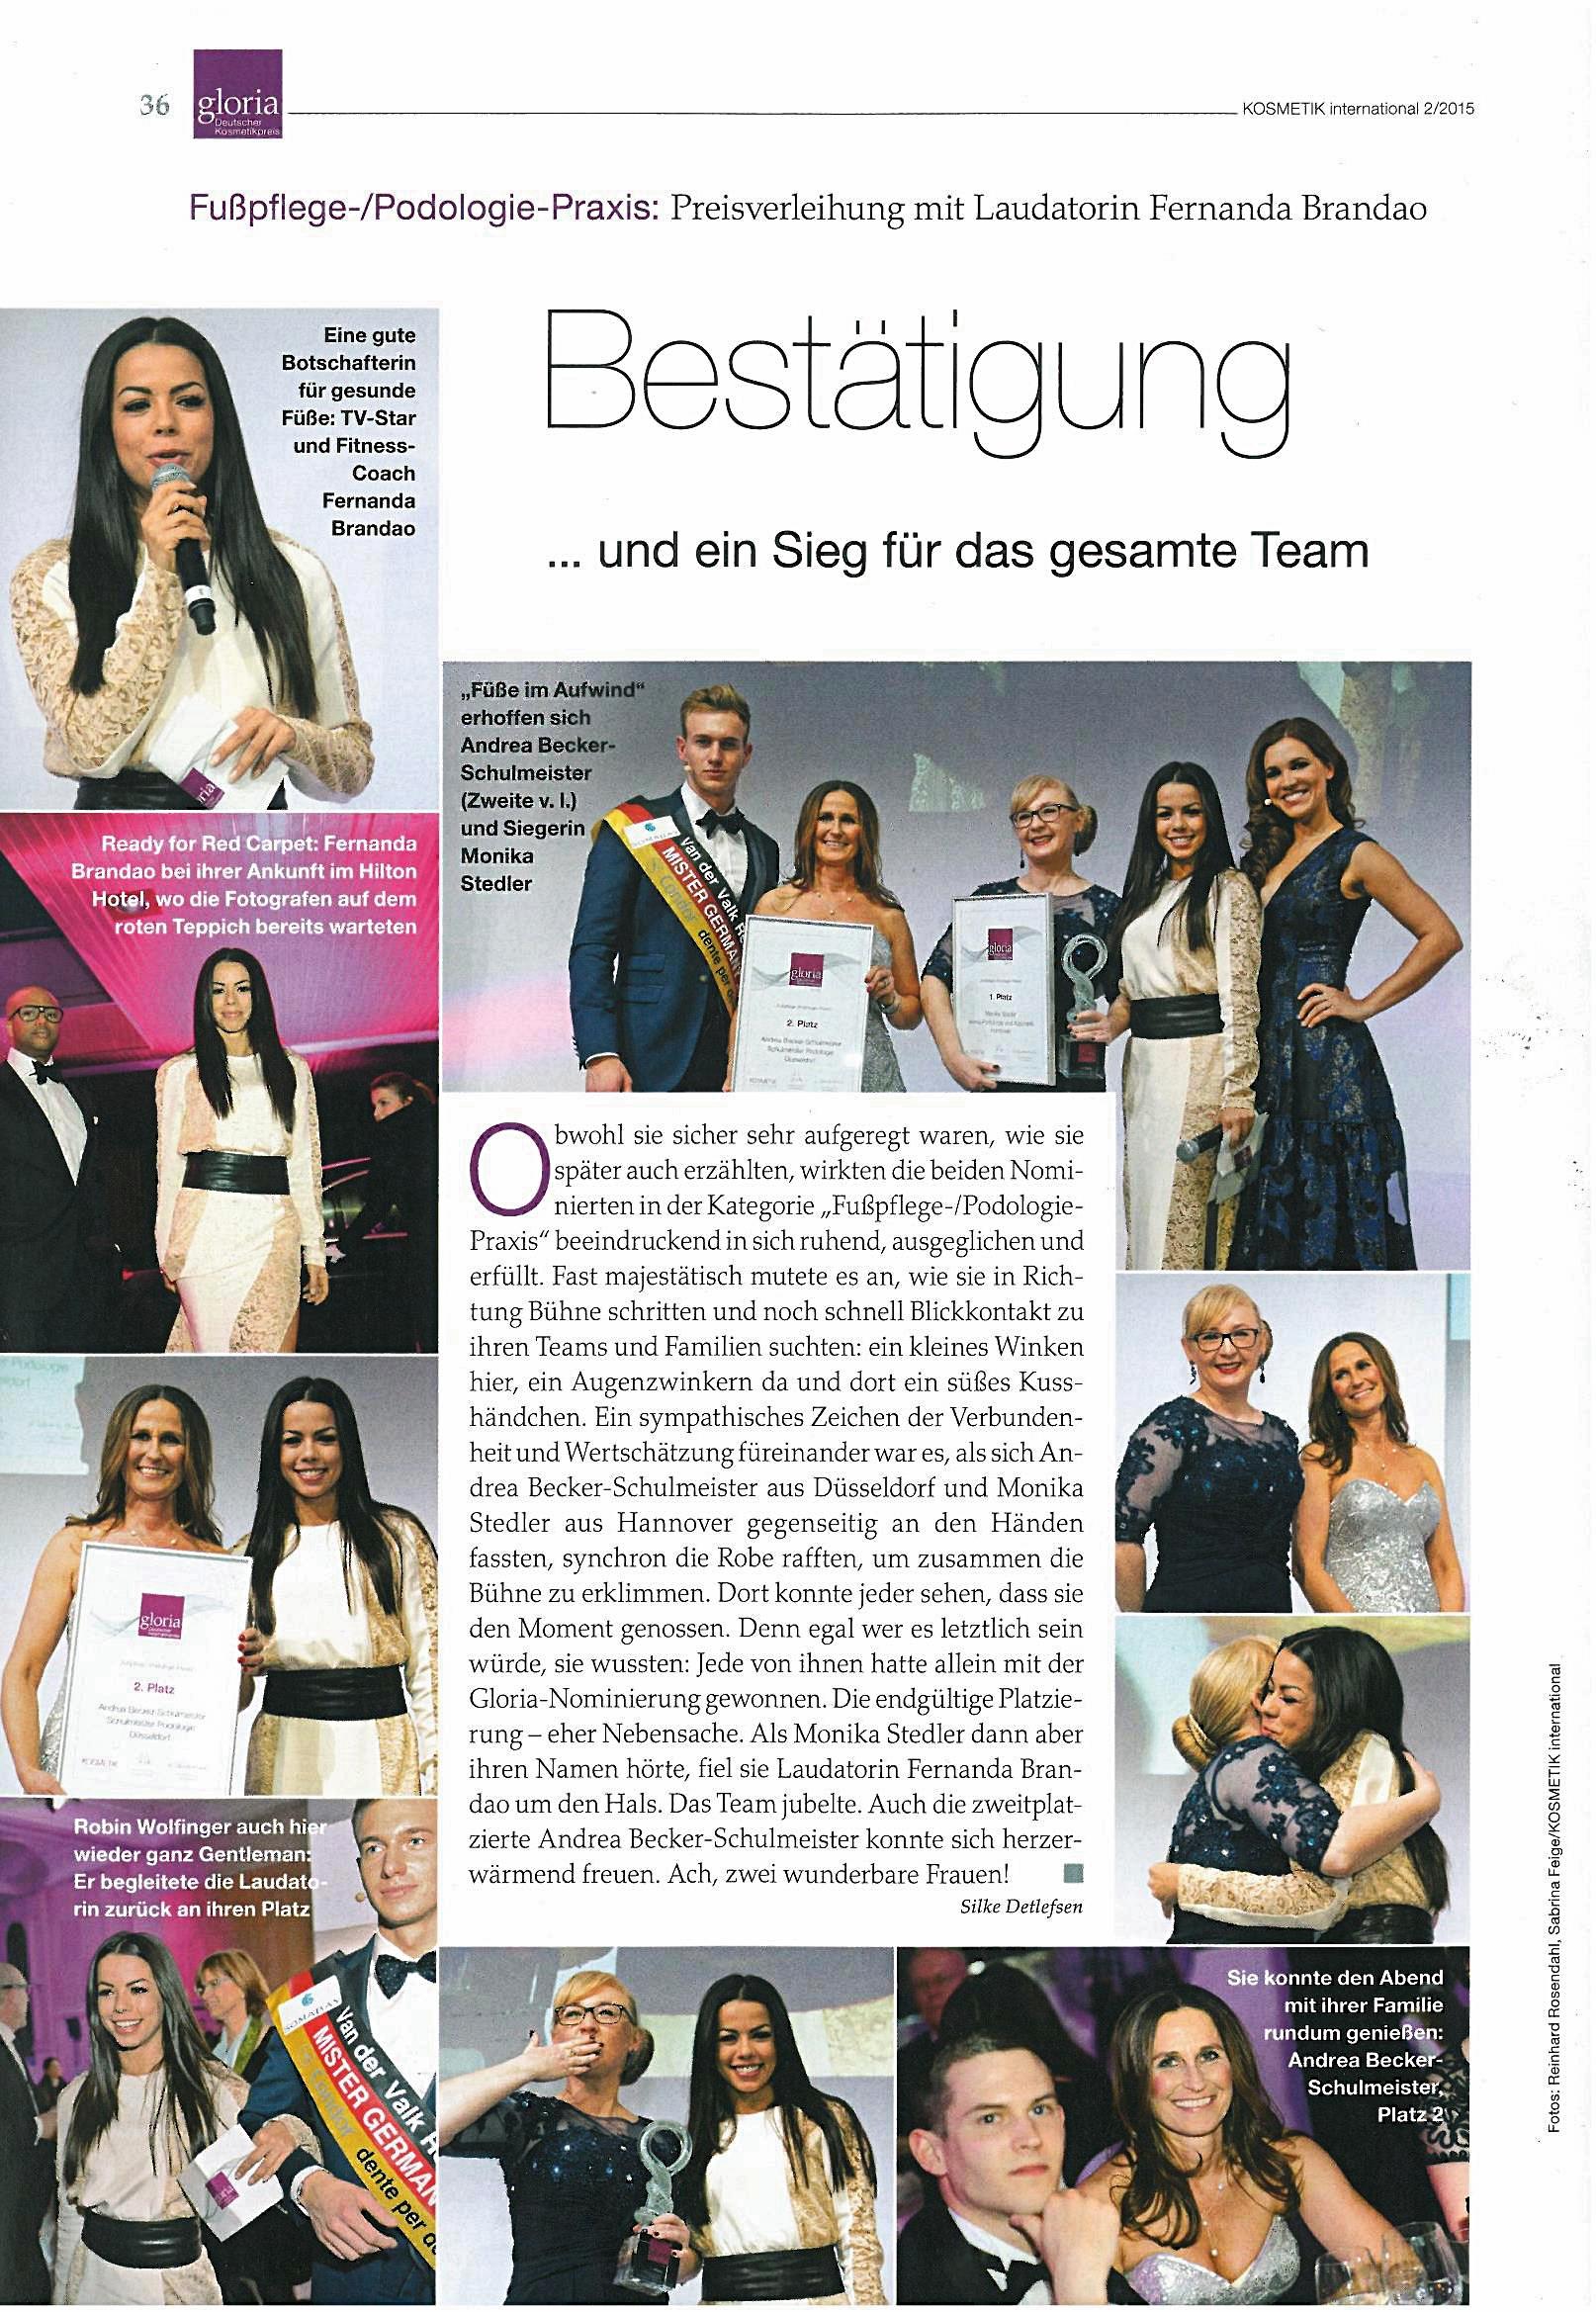 Sonderausgabe 2/2015 Kosmetik International Das Event, S. 36